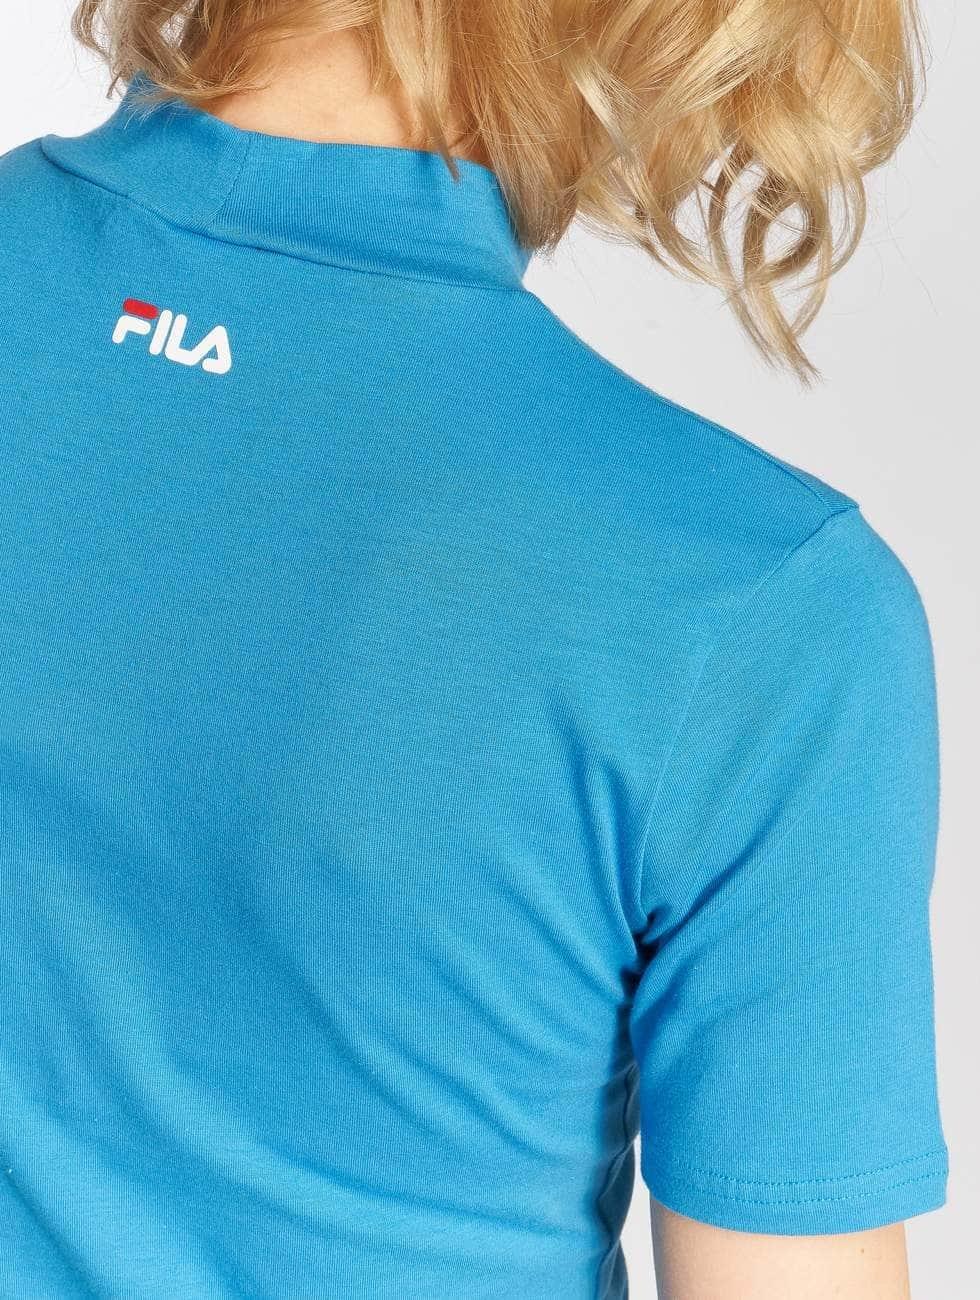 FILA T-Shirt Every Turtle blau